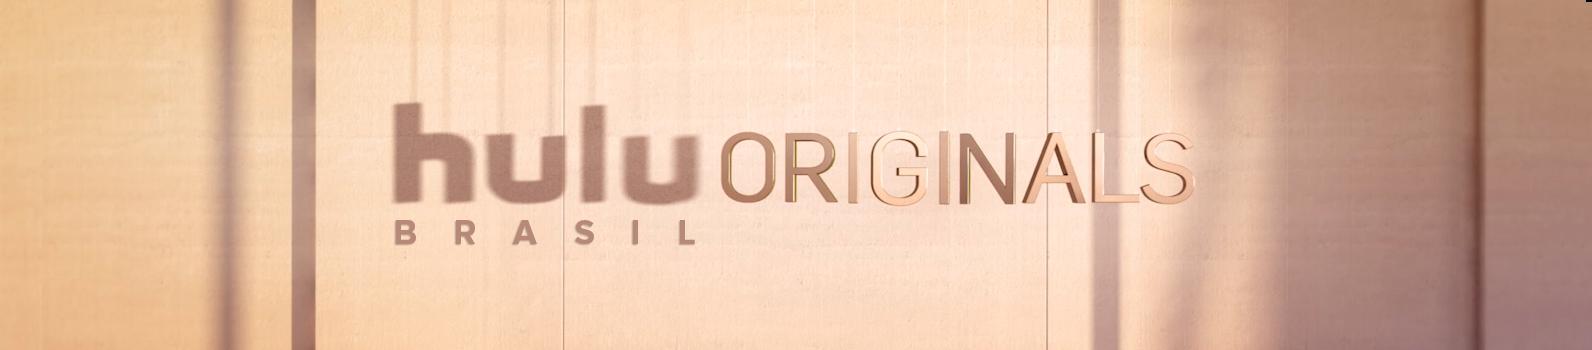 Hulu Brasil